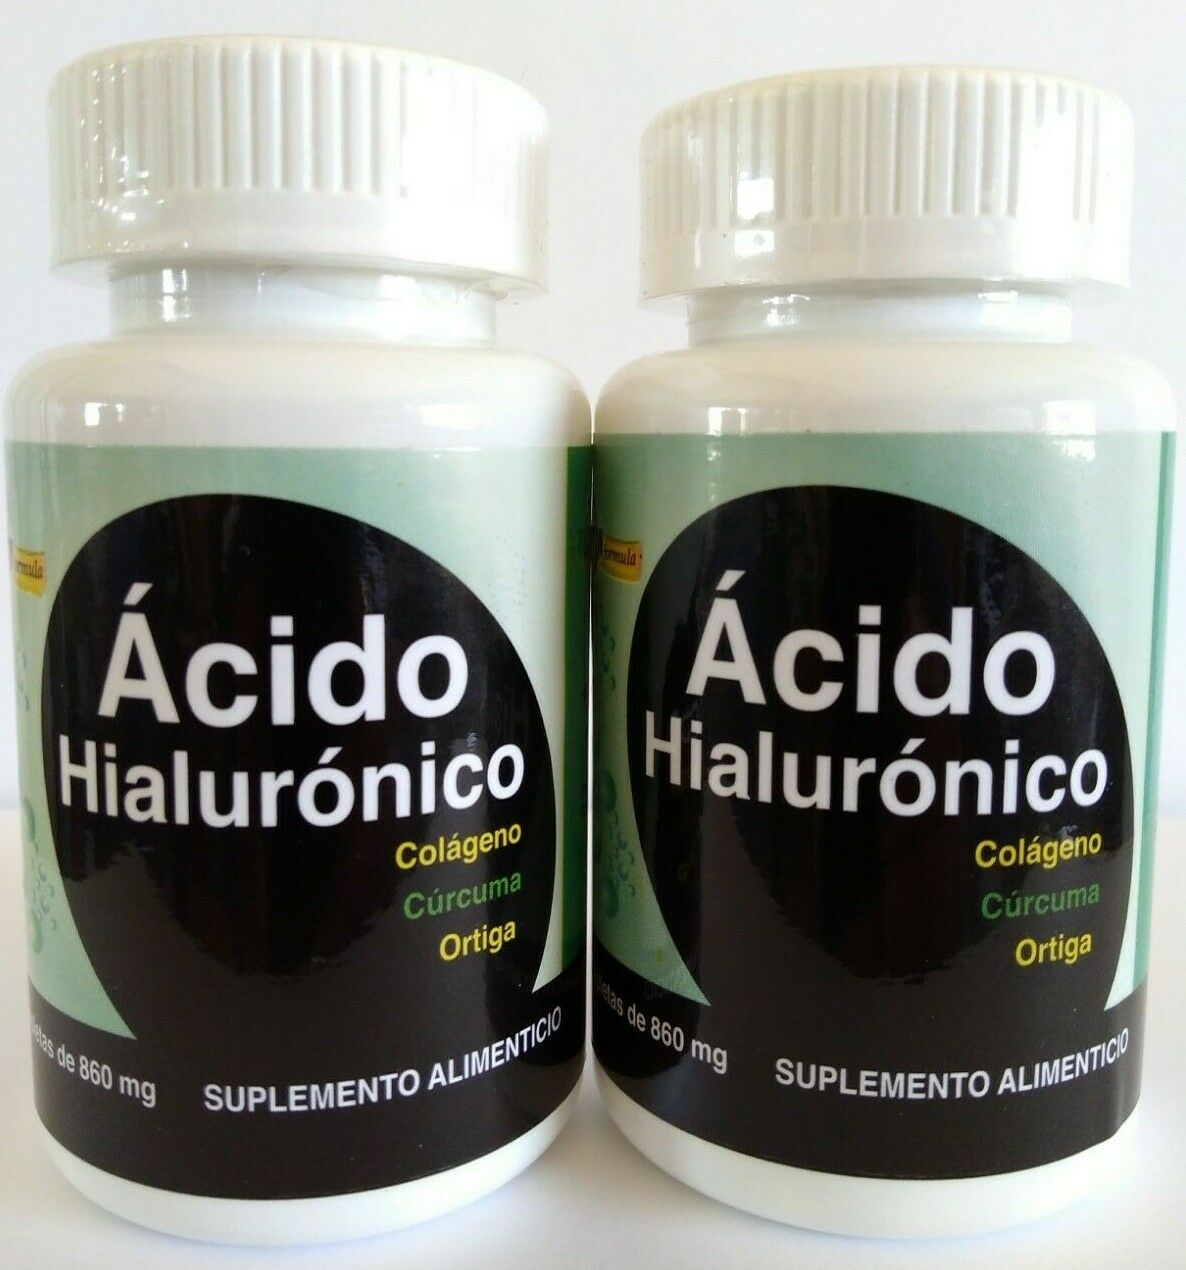 2X ACIDO HIALURONICO 100% ORIGINAL COLAGENO CURCUMA ORTIGA MSM HYALURONIC ACID